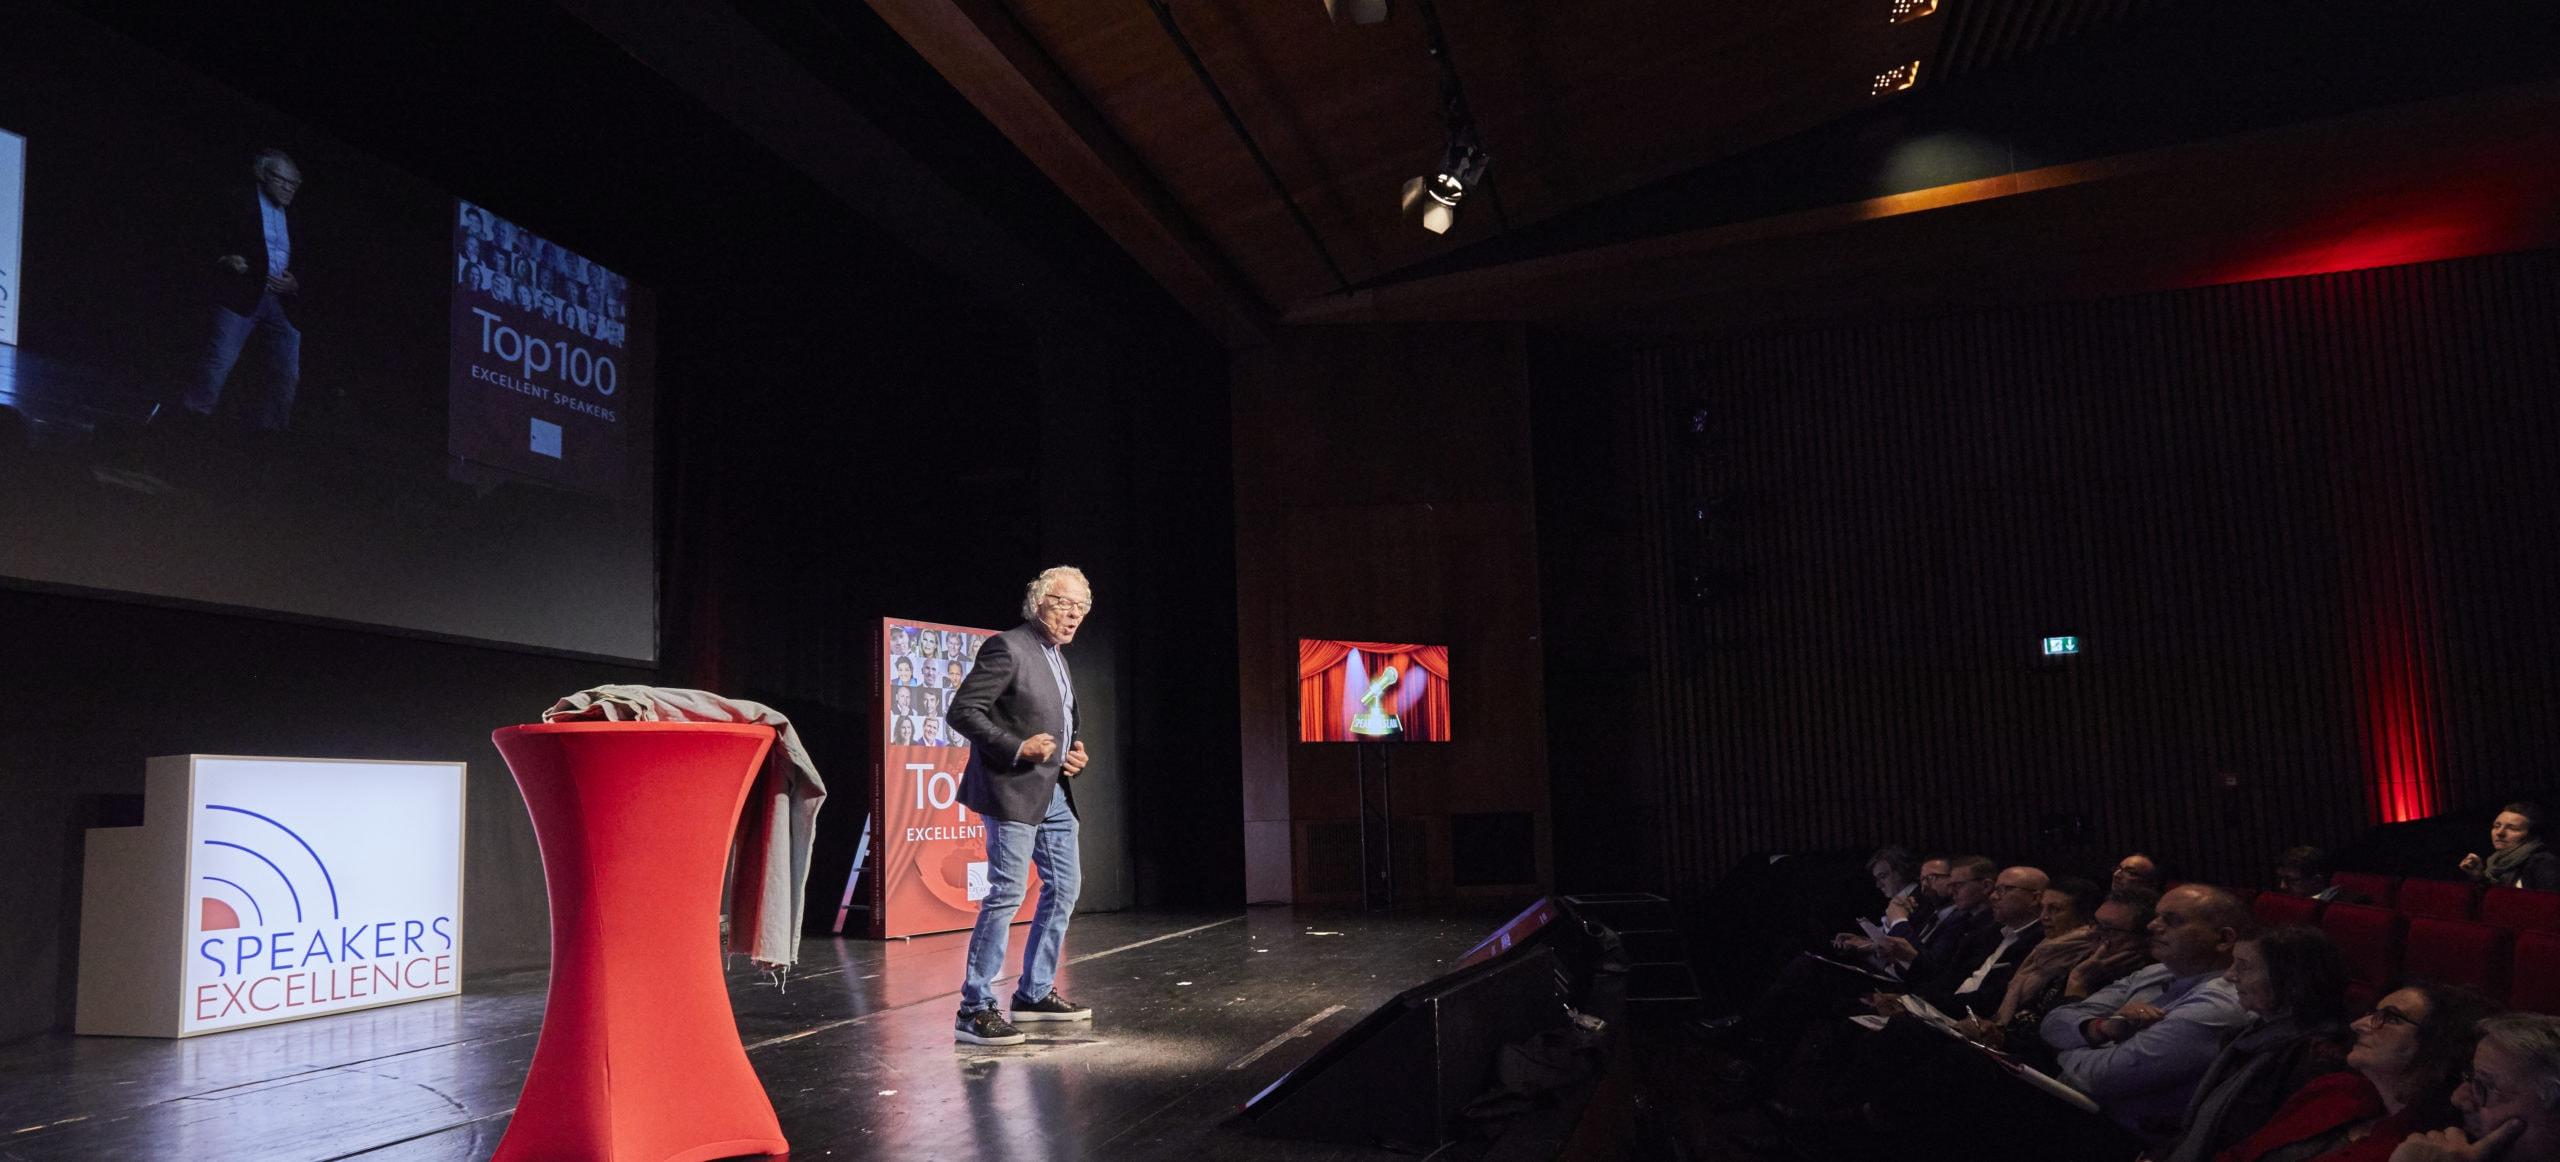 Siegfried Ott - Profi Speaker über Lifestyle